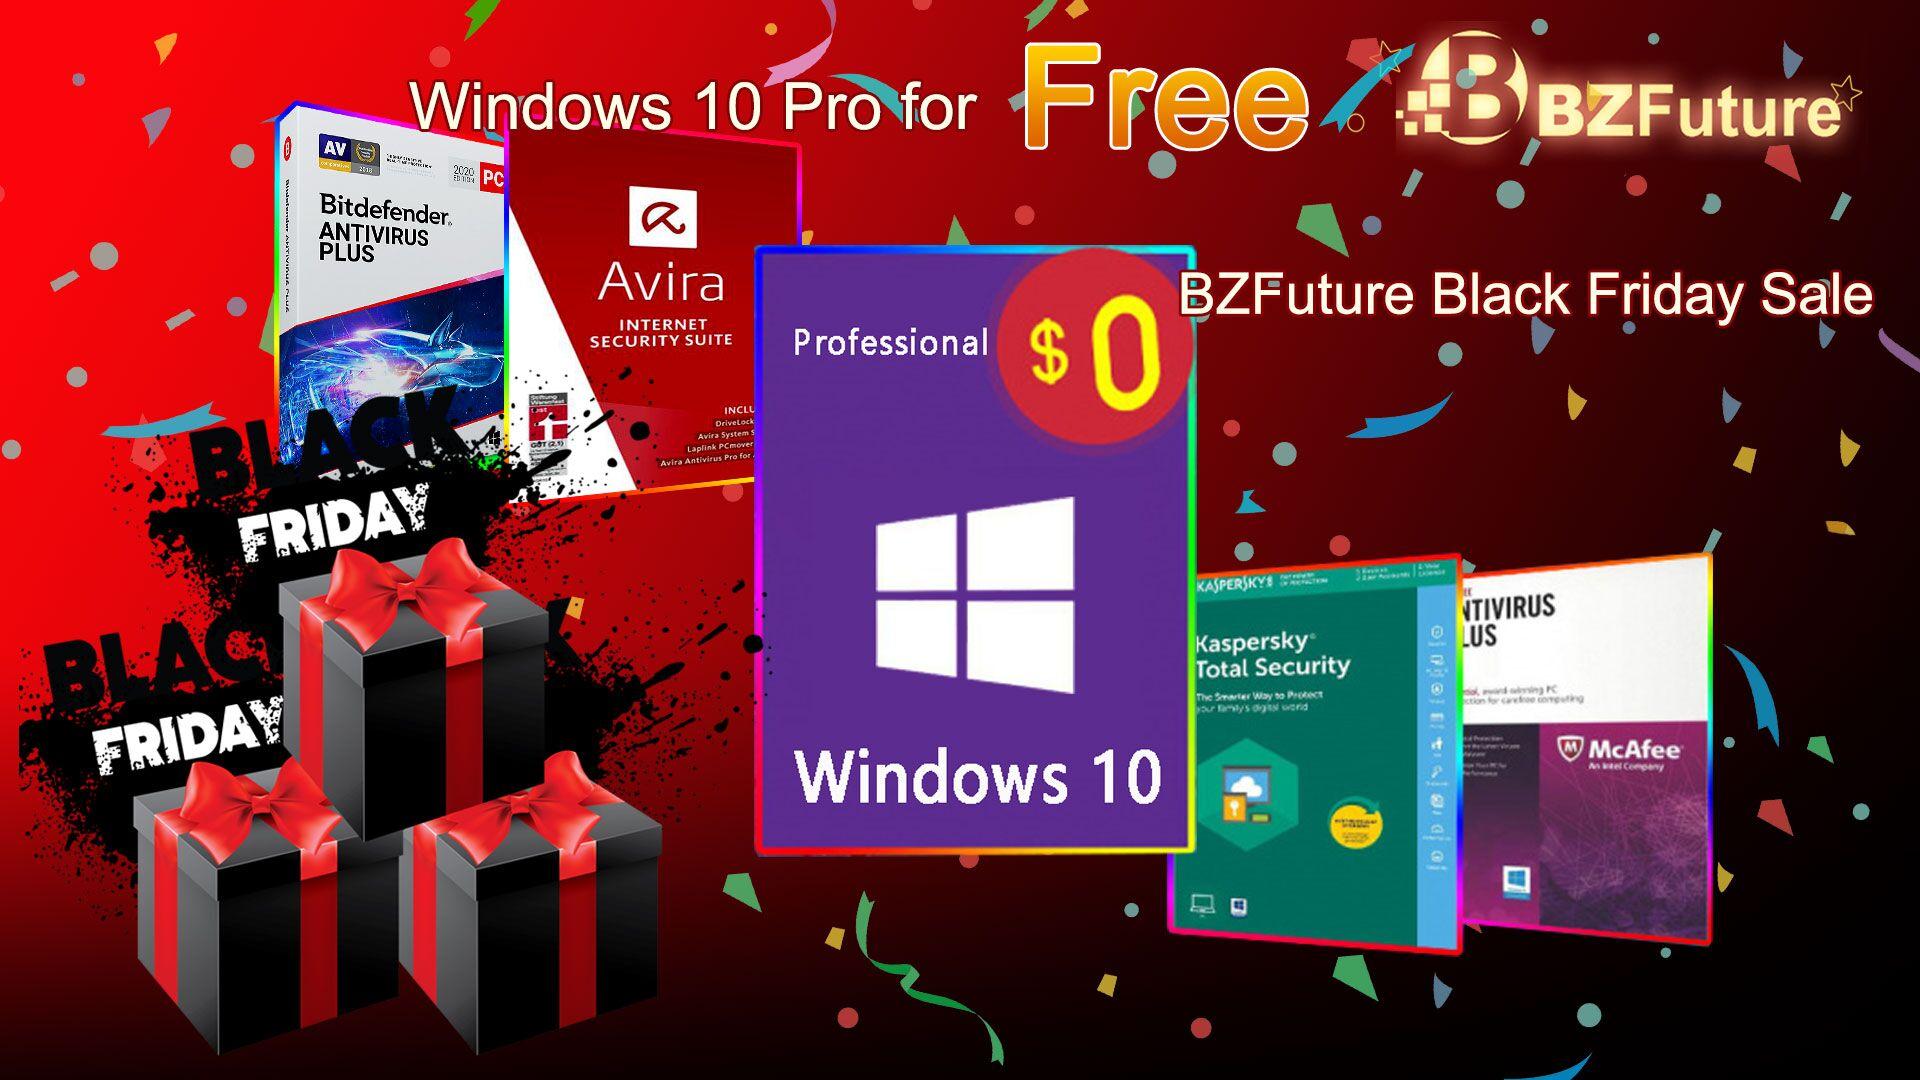 Windows 10 gratis en BZfuture Black Friday 0